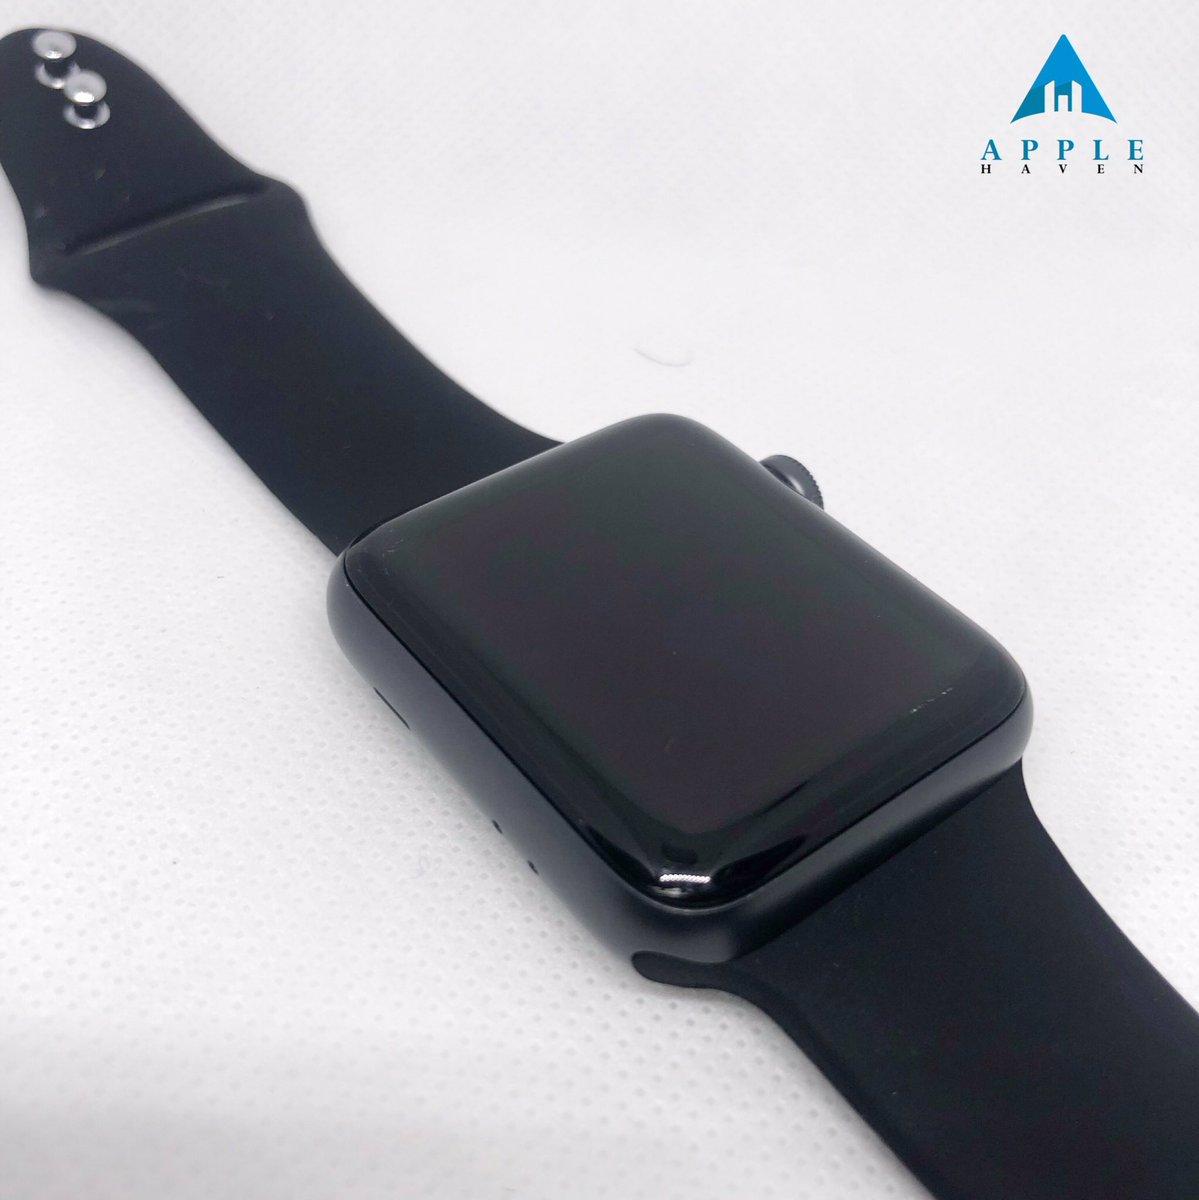 juse_eledu DM or Whatsapp 08089451005 to order Apple Watch